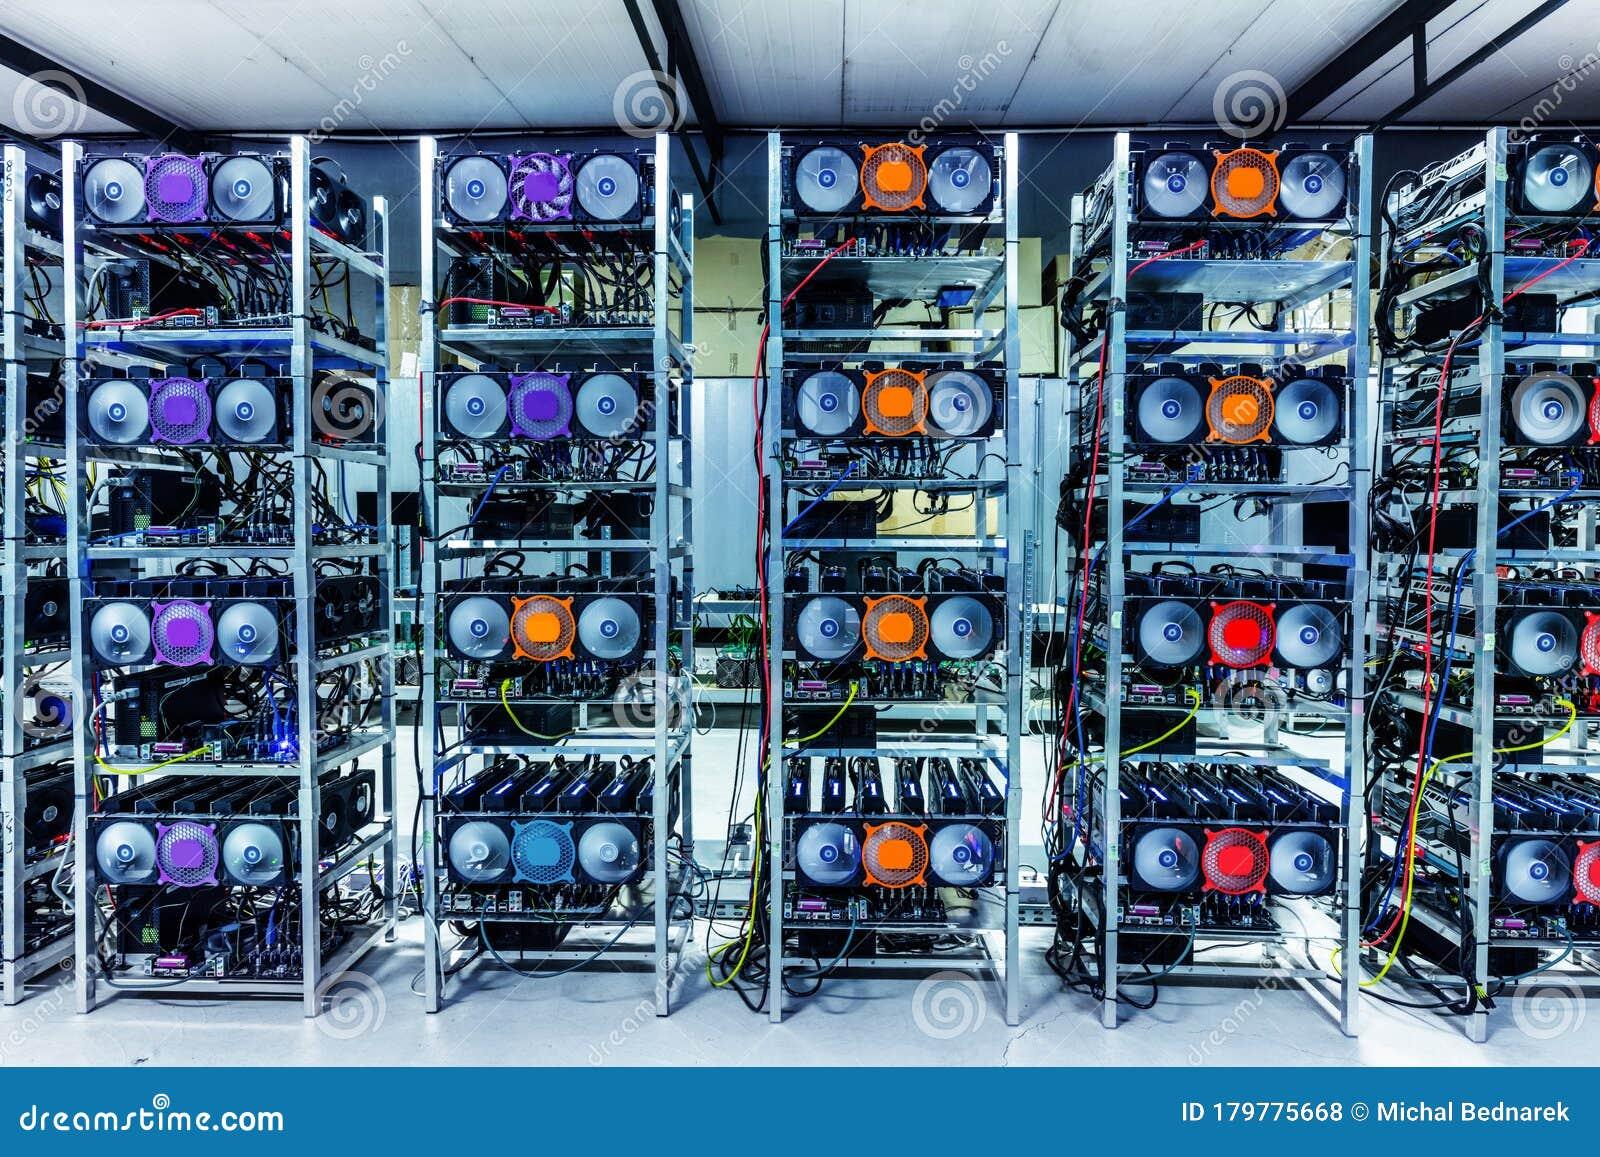 Bitcoin And Crypto Mining Farm. Big Data Center Editorial ...